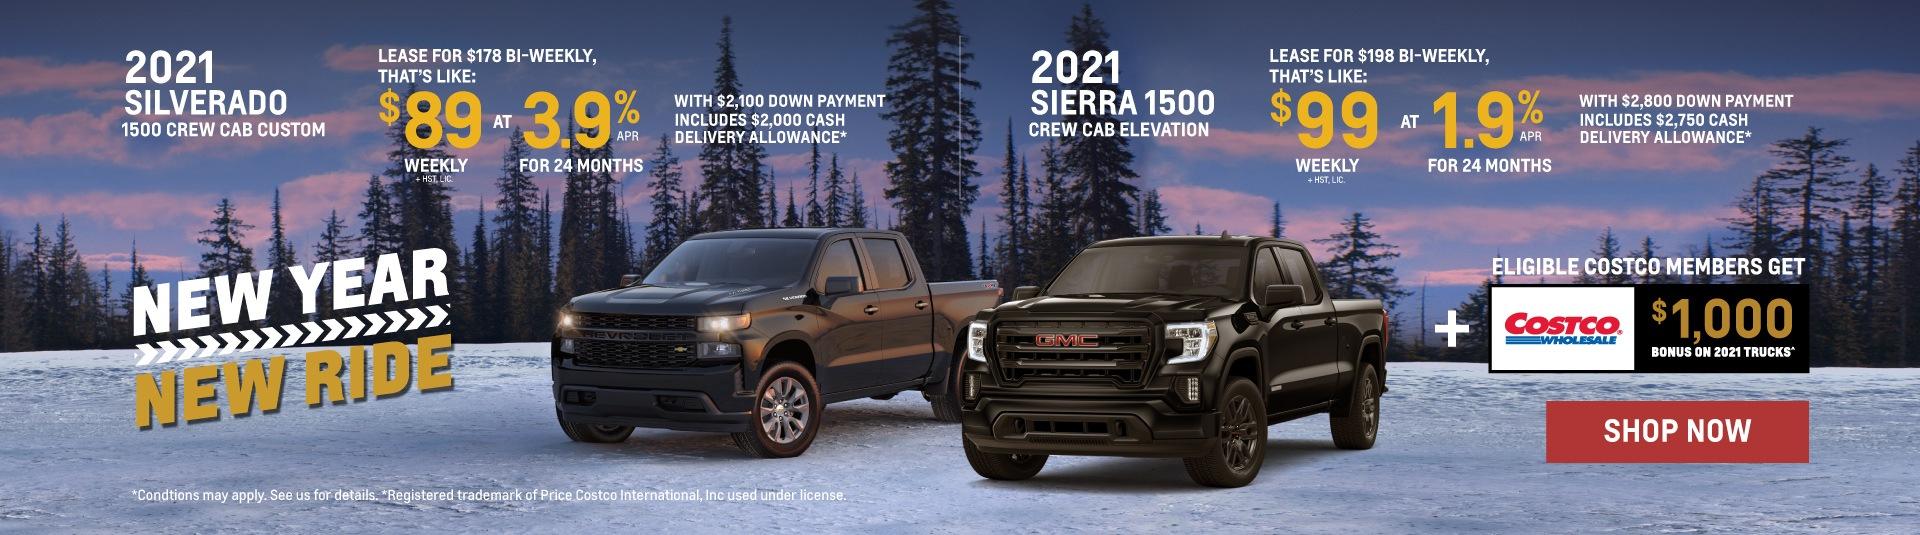 2021 Chevrolet Silverado and 2021 GMC Sierra Offers in Toronto